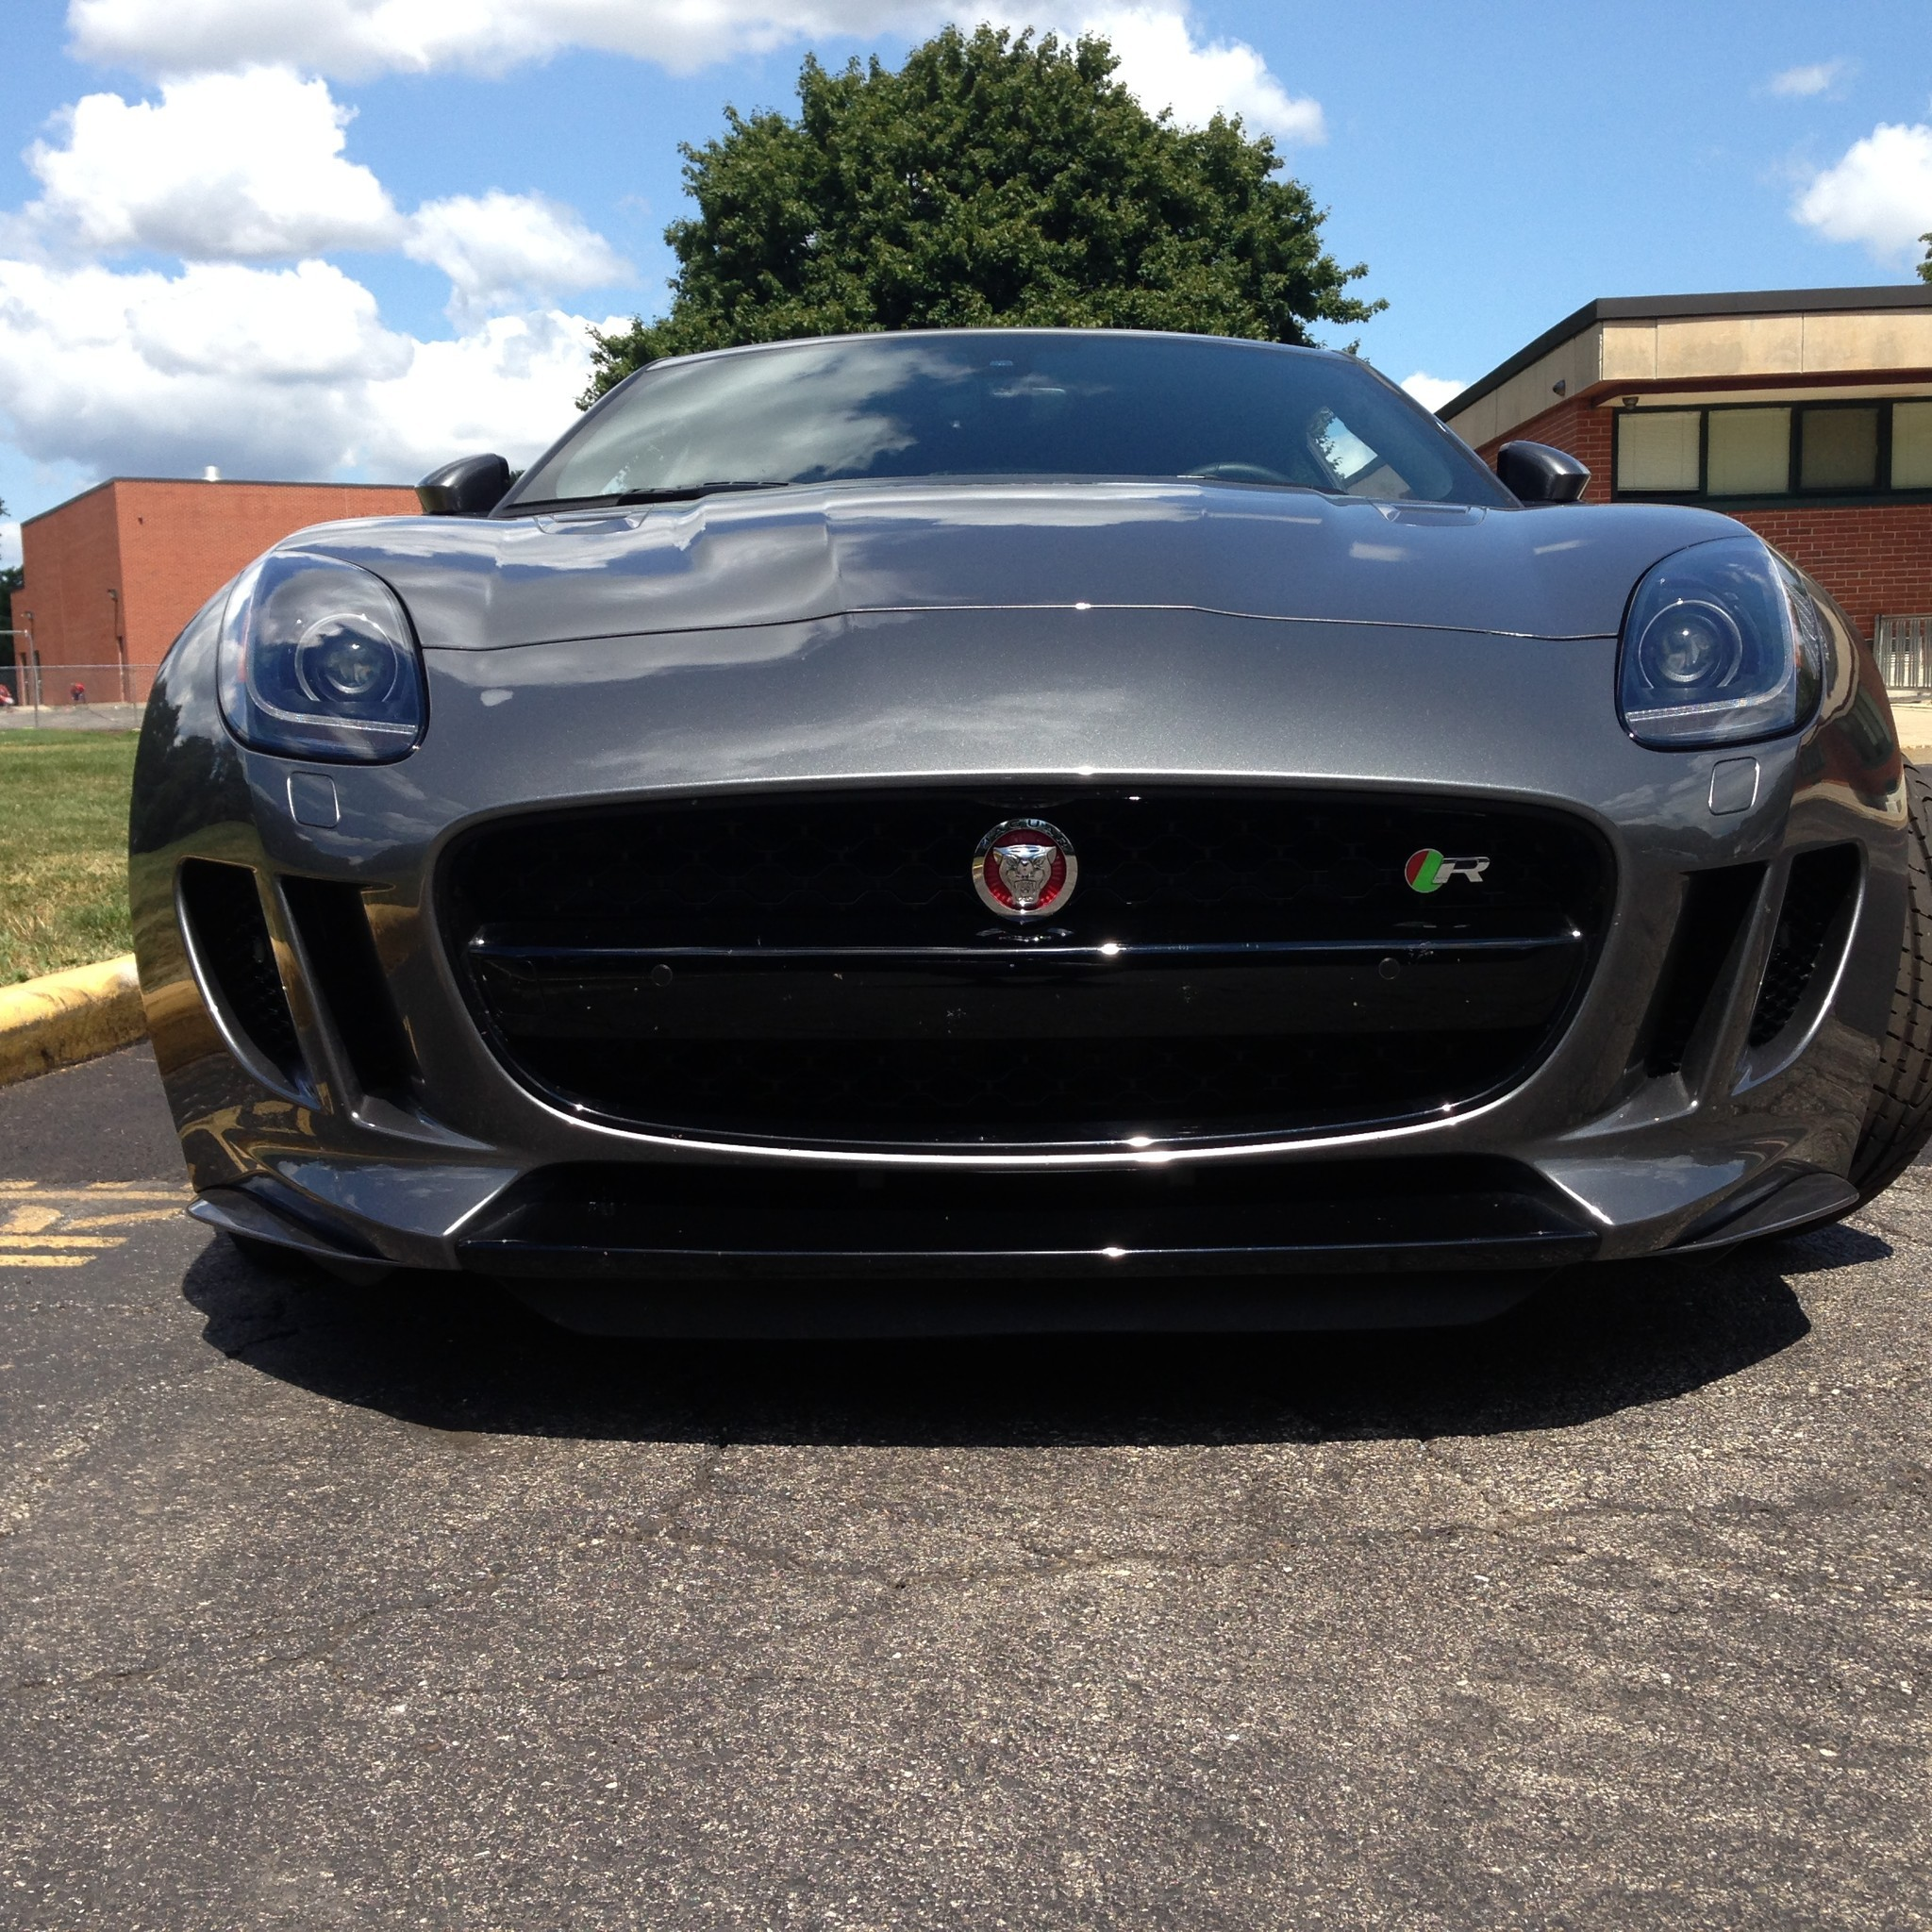 2016 Jaguar FType R is a civilized brute of a sports car